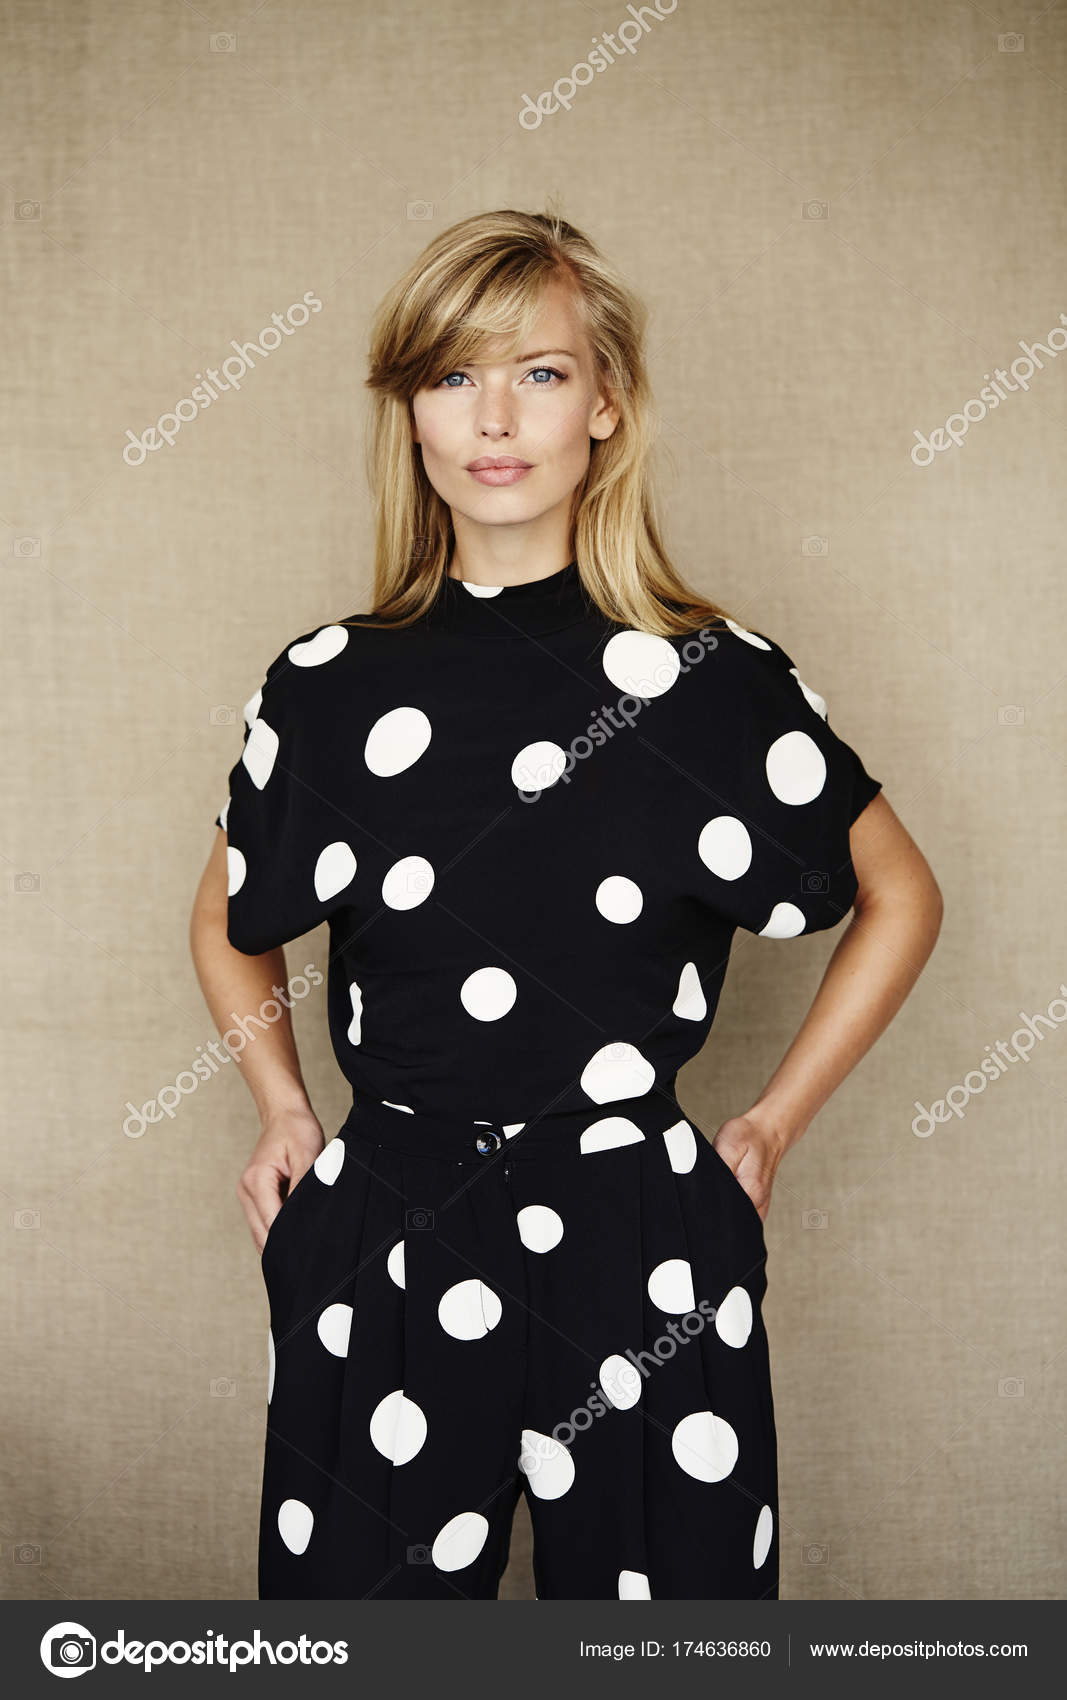 6414aa822 mujer rubia en vestido manchado — Foto de stock © sanneberg  174636860